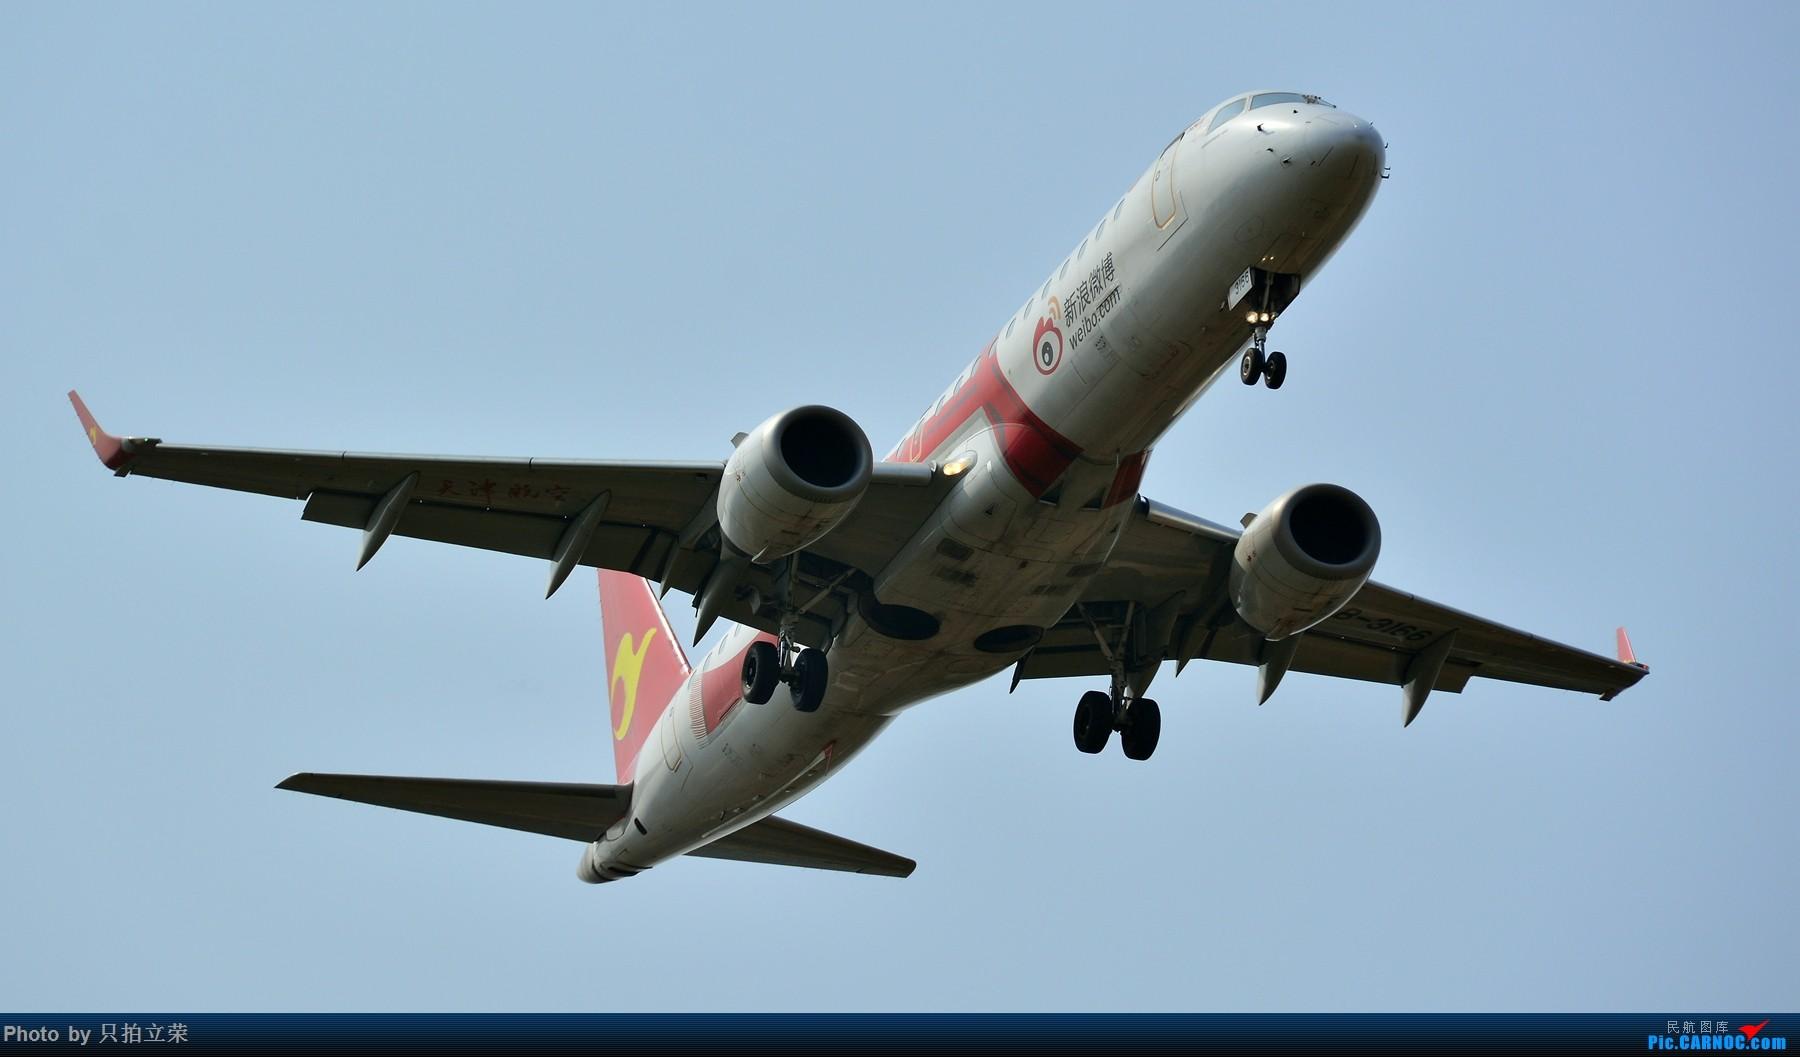 Re:[原创]湖南飞友会之10月9日长沙黄花好货满天飞! EMBRAER E-190 B-3166 中国长沙黄花国际机场